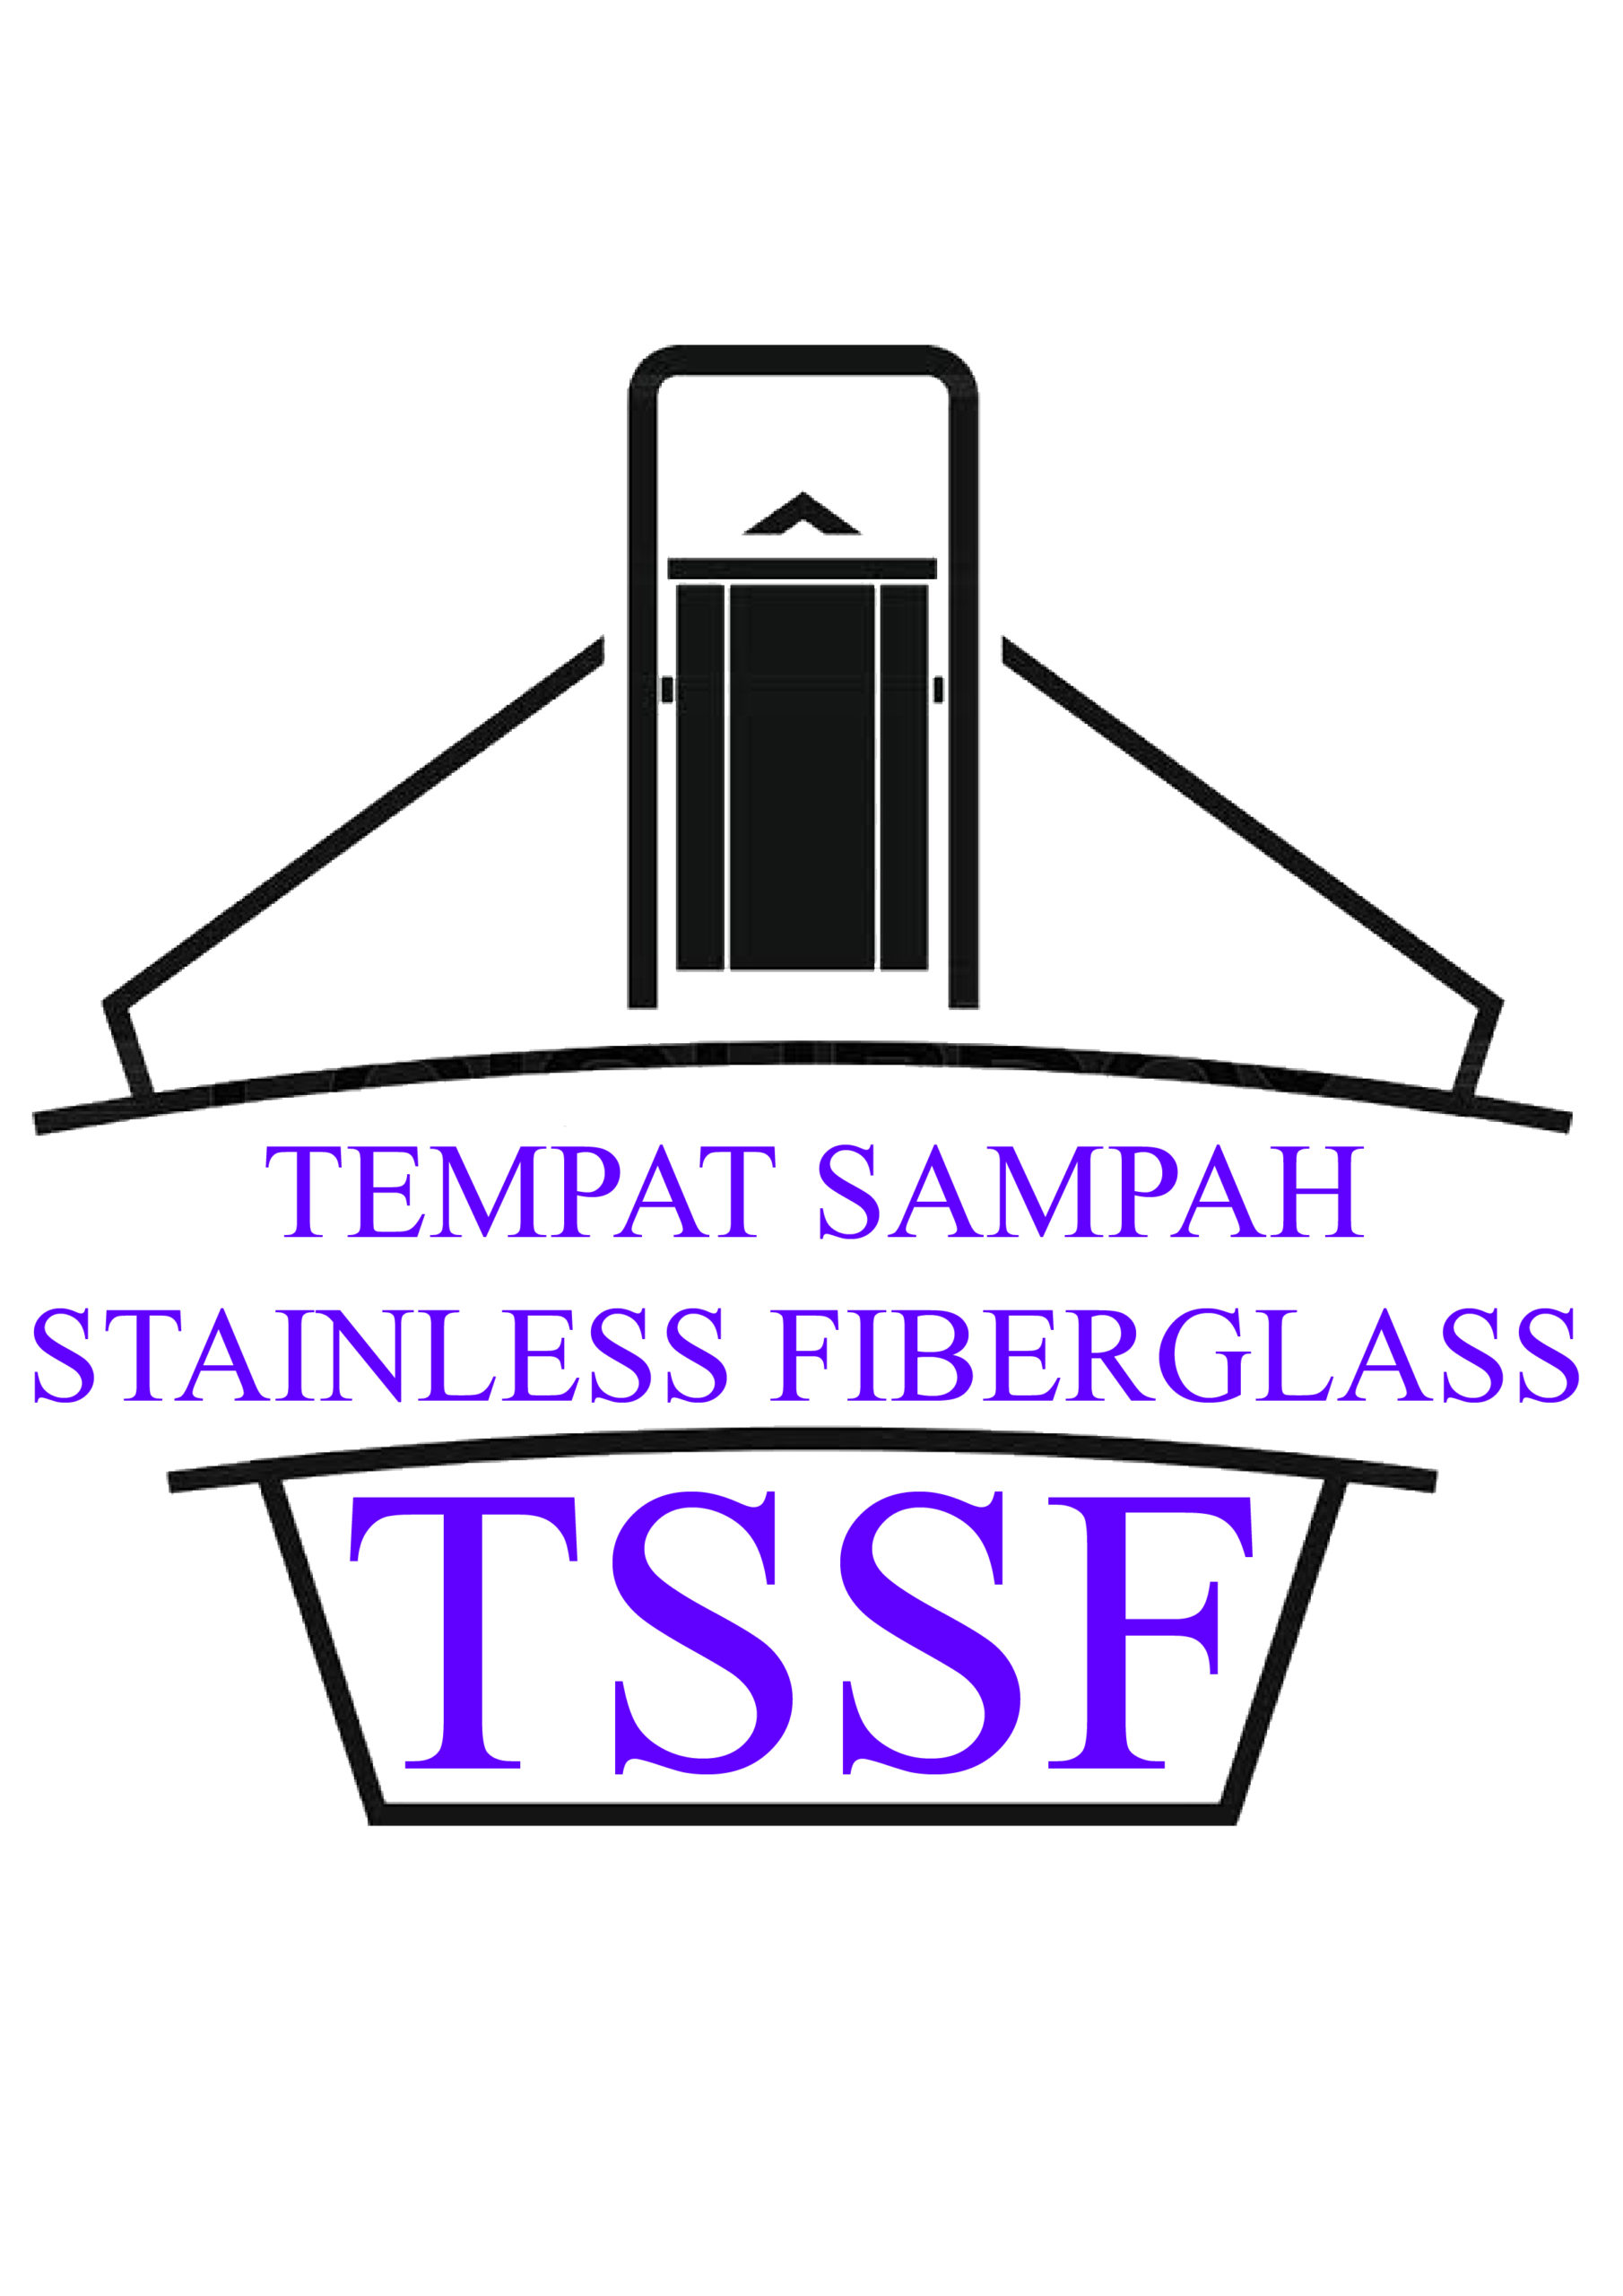 TEMPAT SAMPAH STAINLESS FIBERGLASS